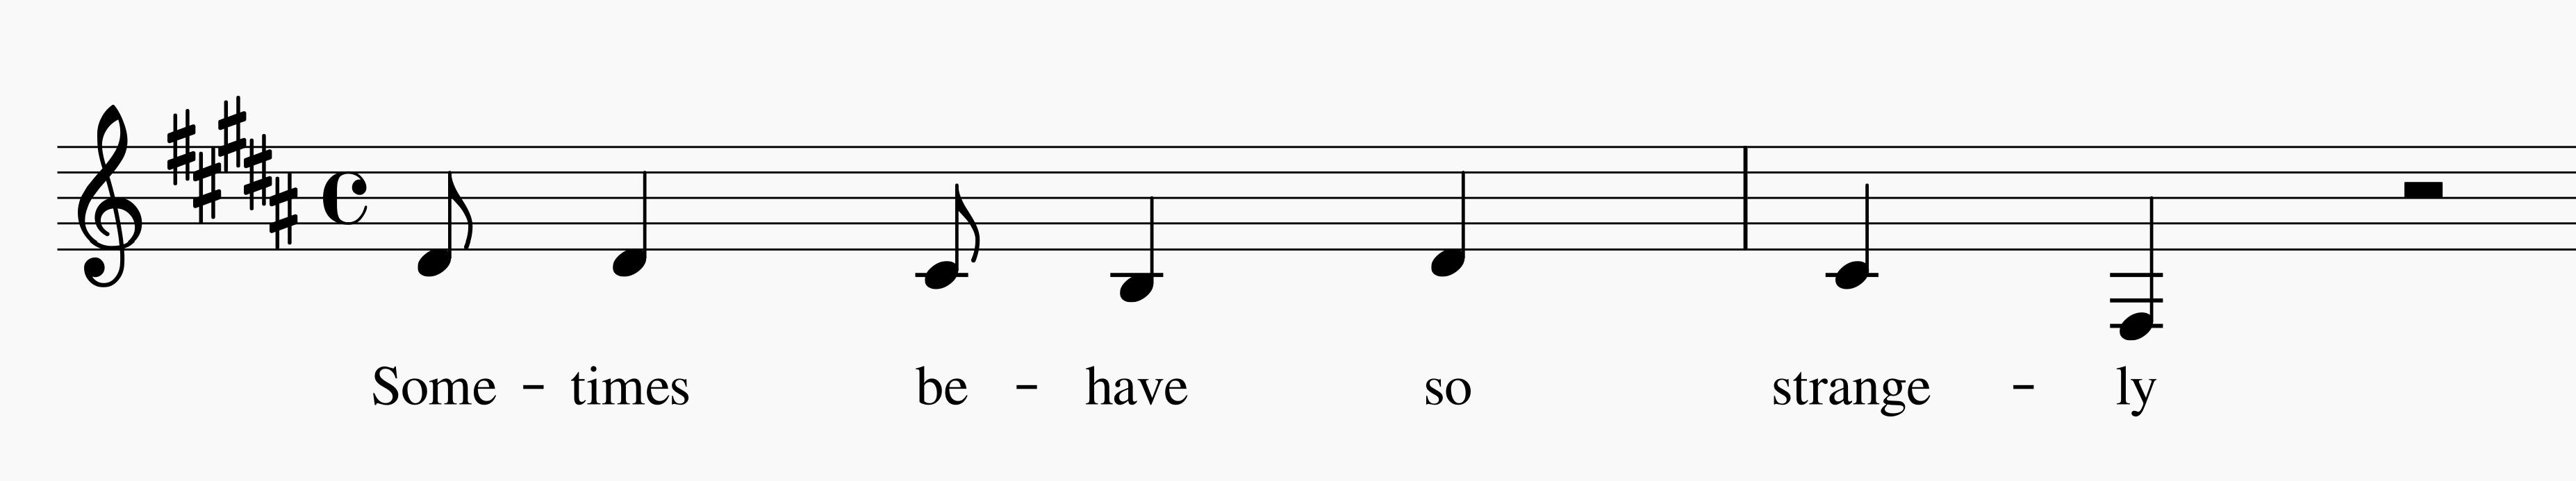 Komaniecki, Figure 2